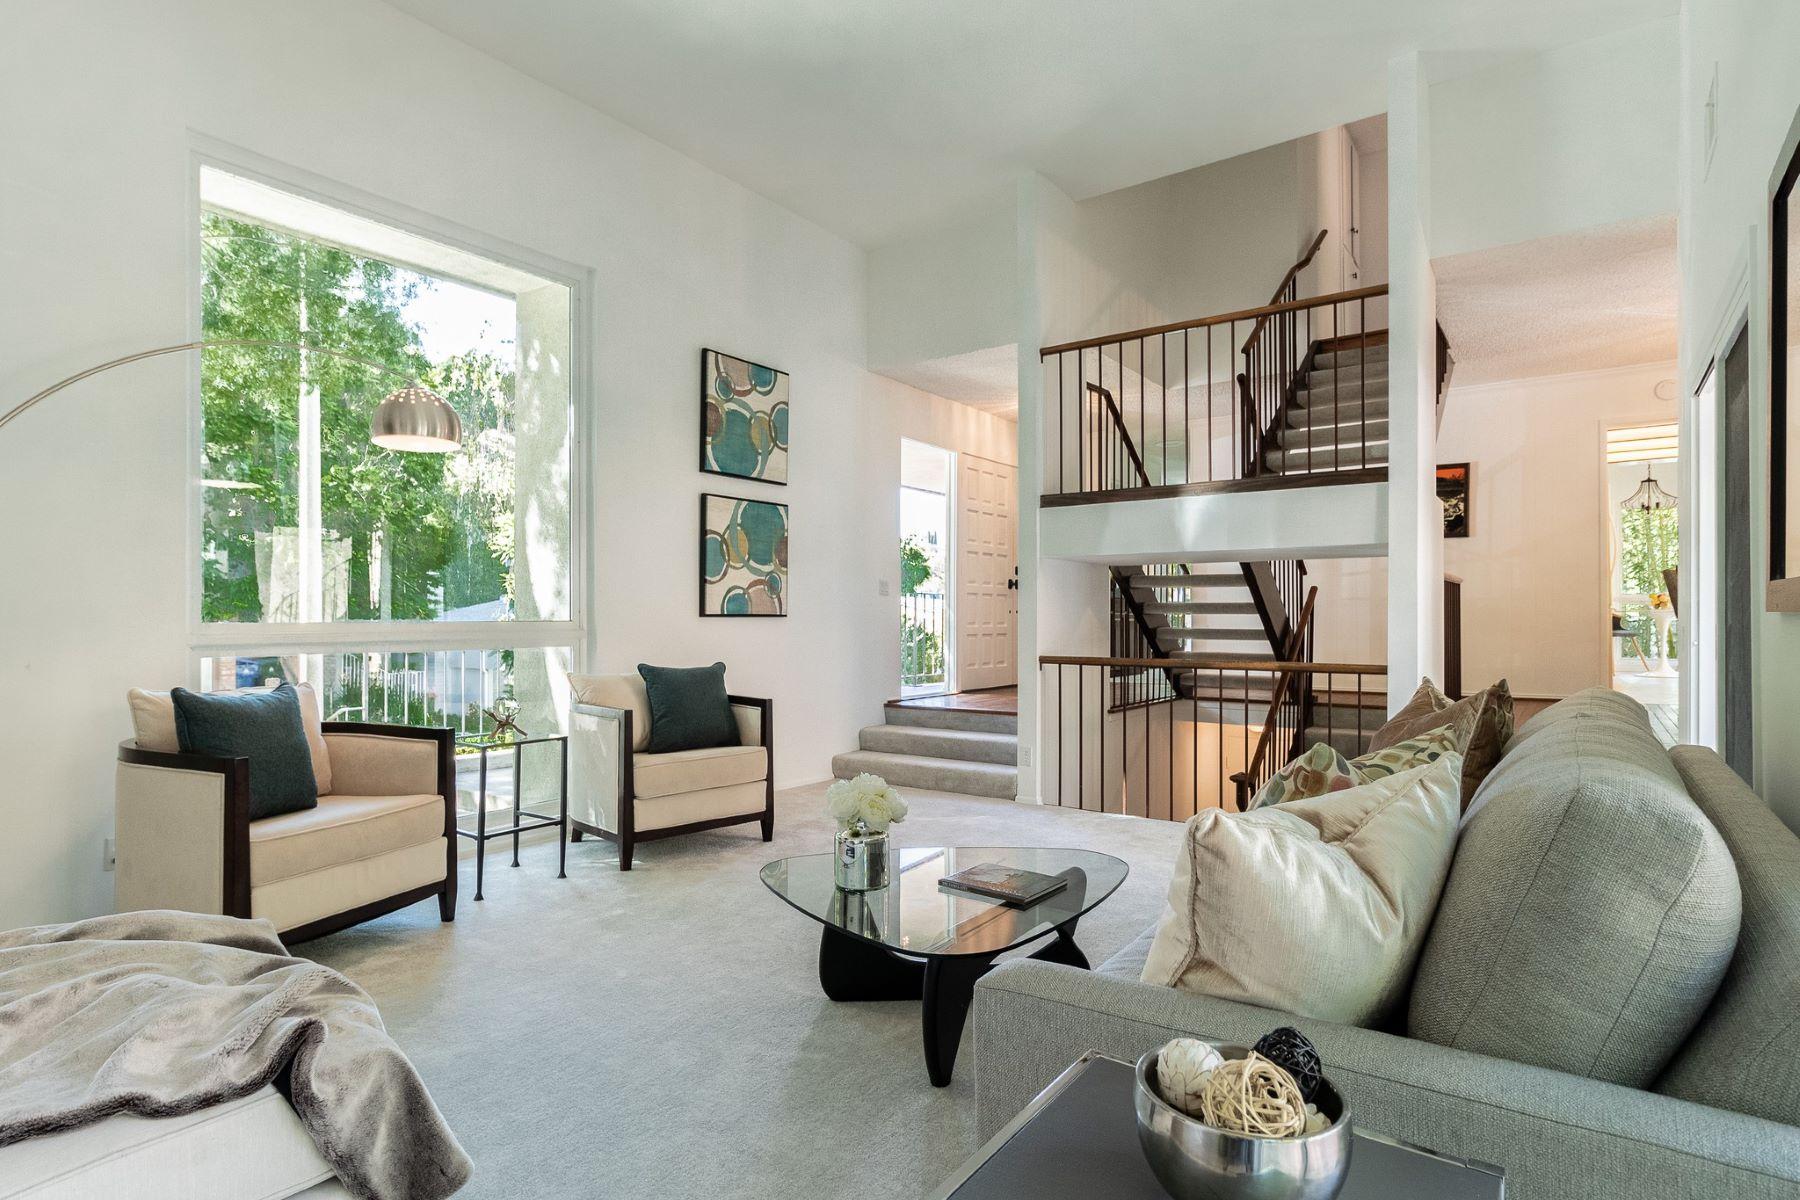 Single Family Homes for Sale at 16986 Escalon Drive Encino, California 91436 United States